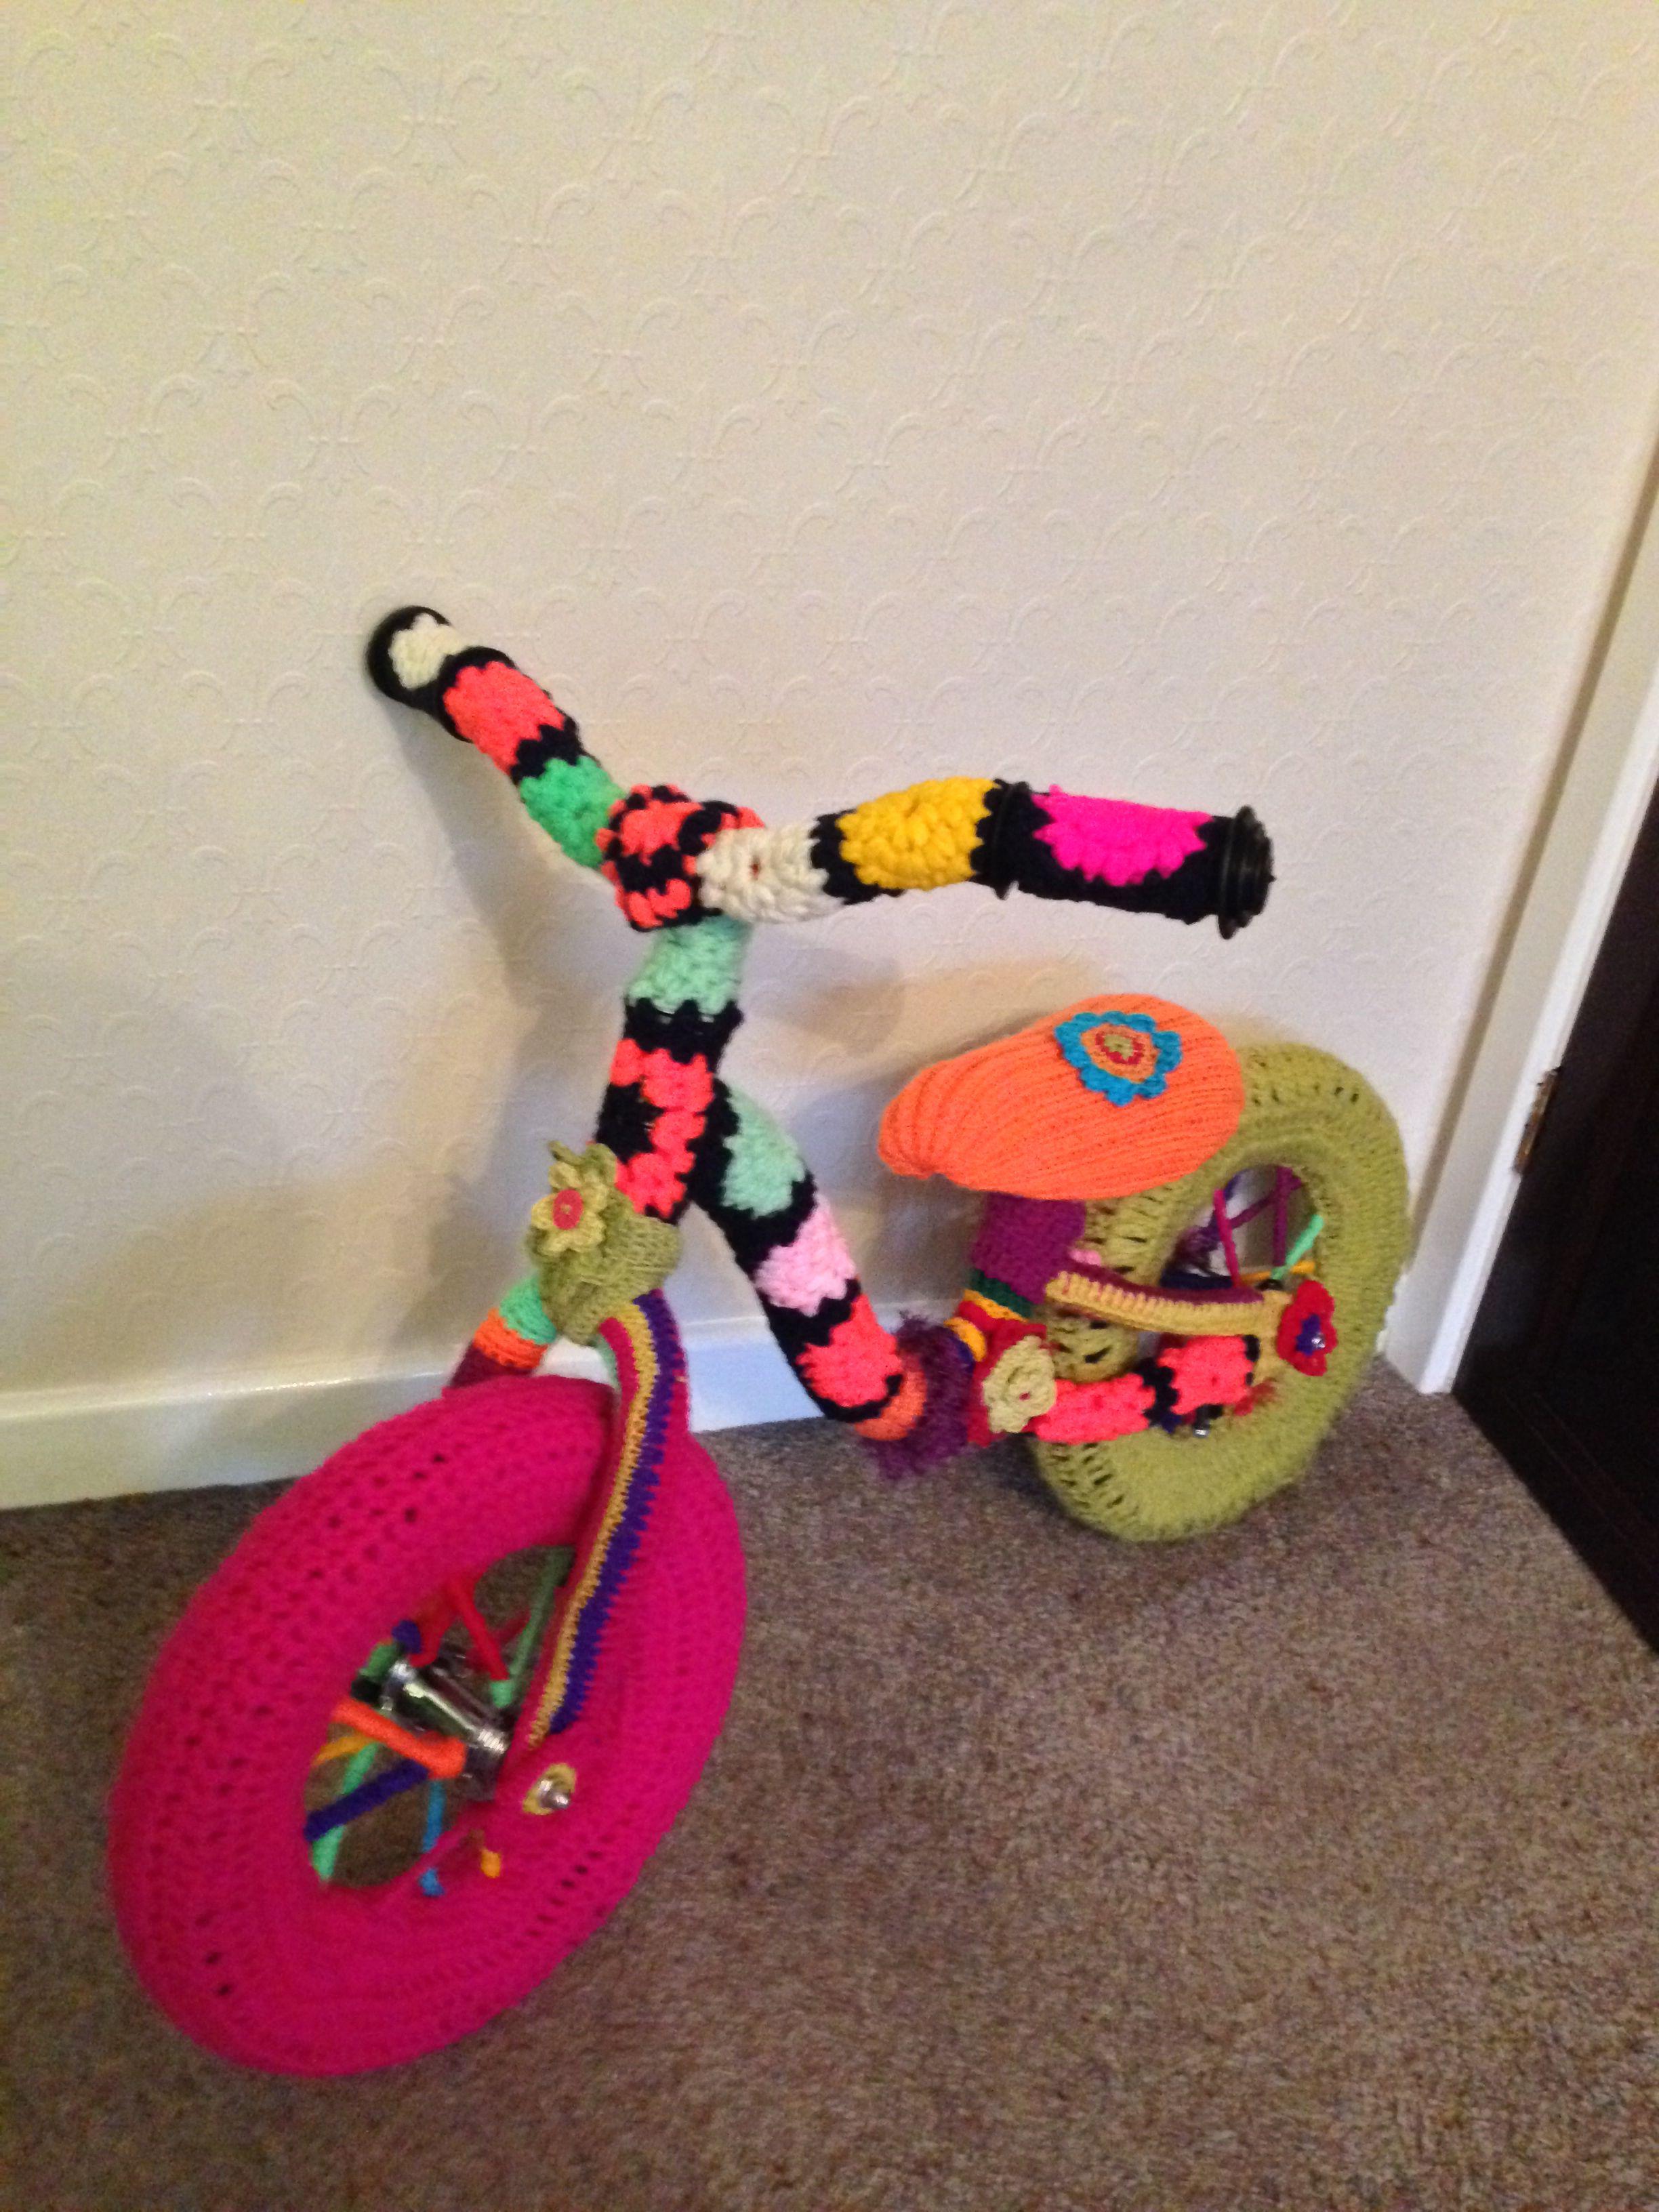 My yarn bombed bike